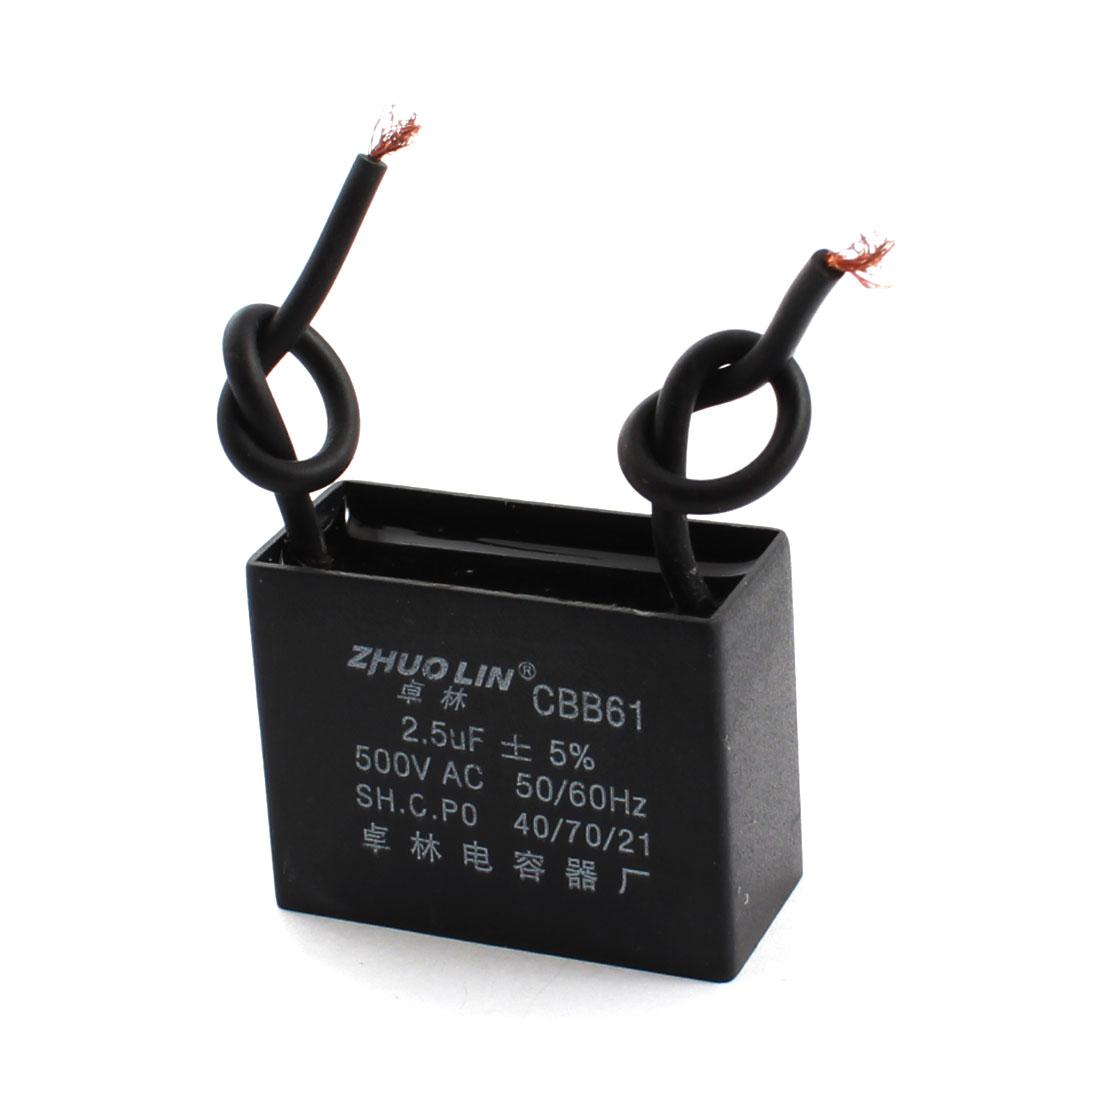 2.5uF 5% AC 500V Polypropylene Film Motor Running Capacitor CBB61